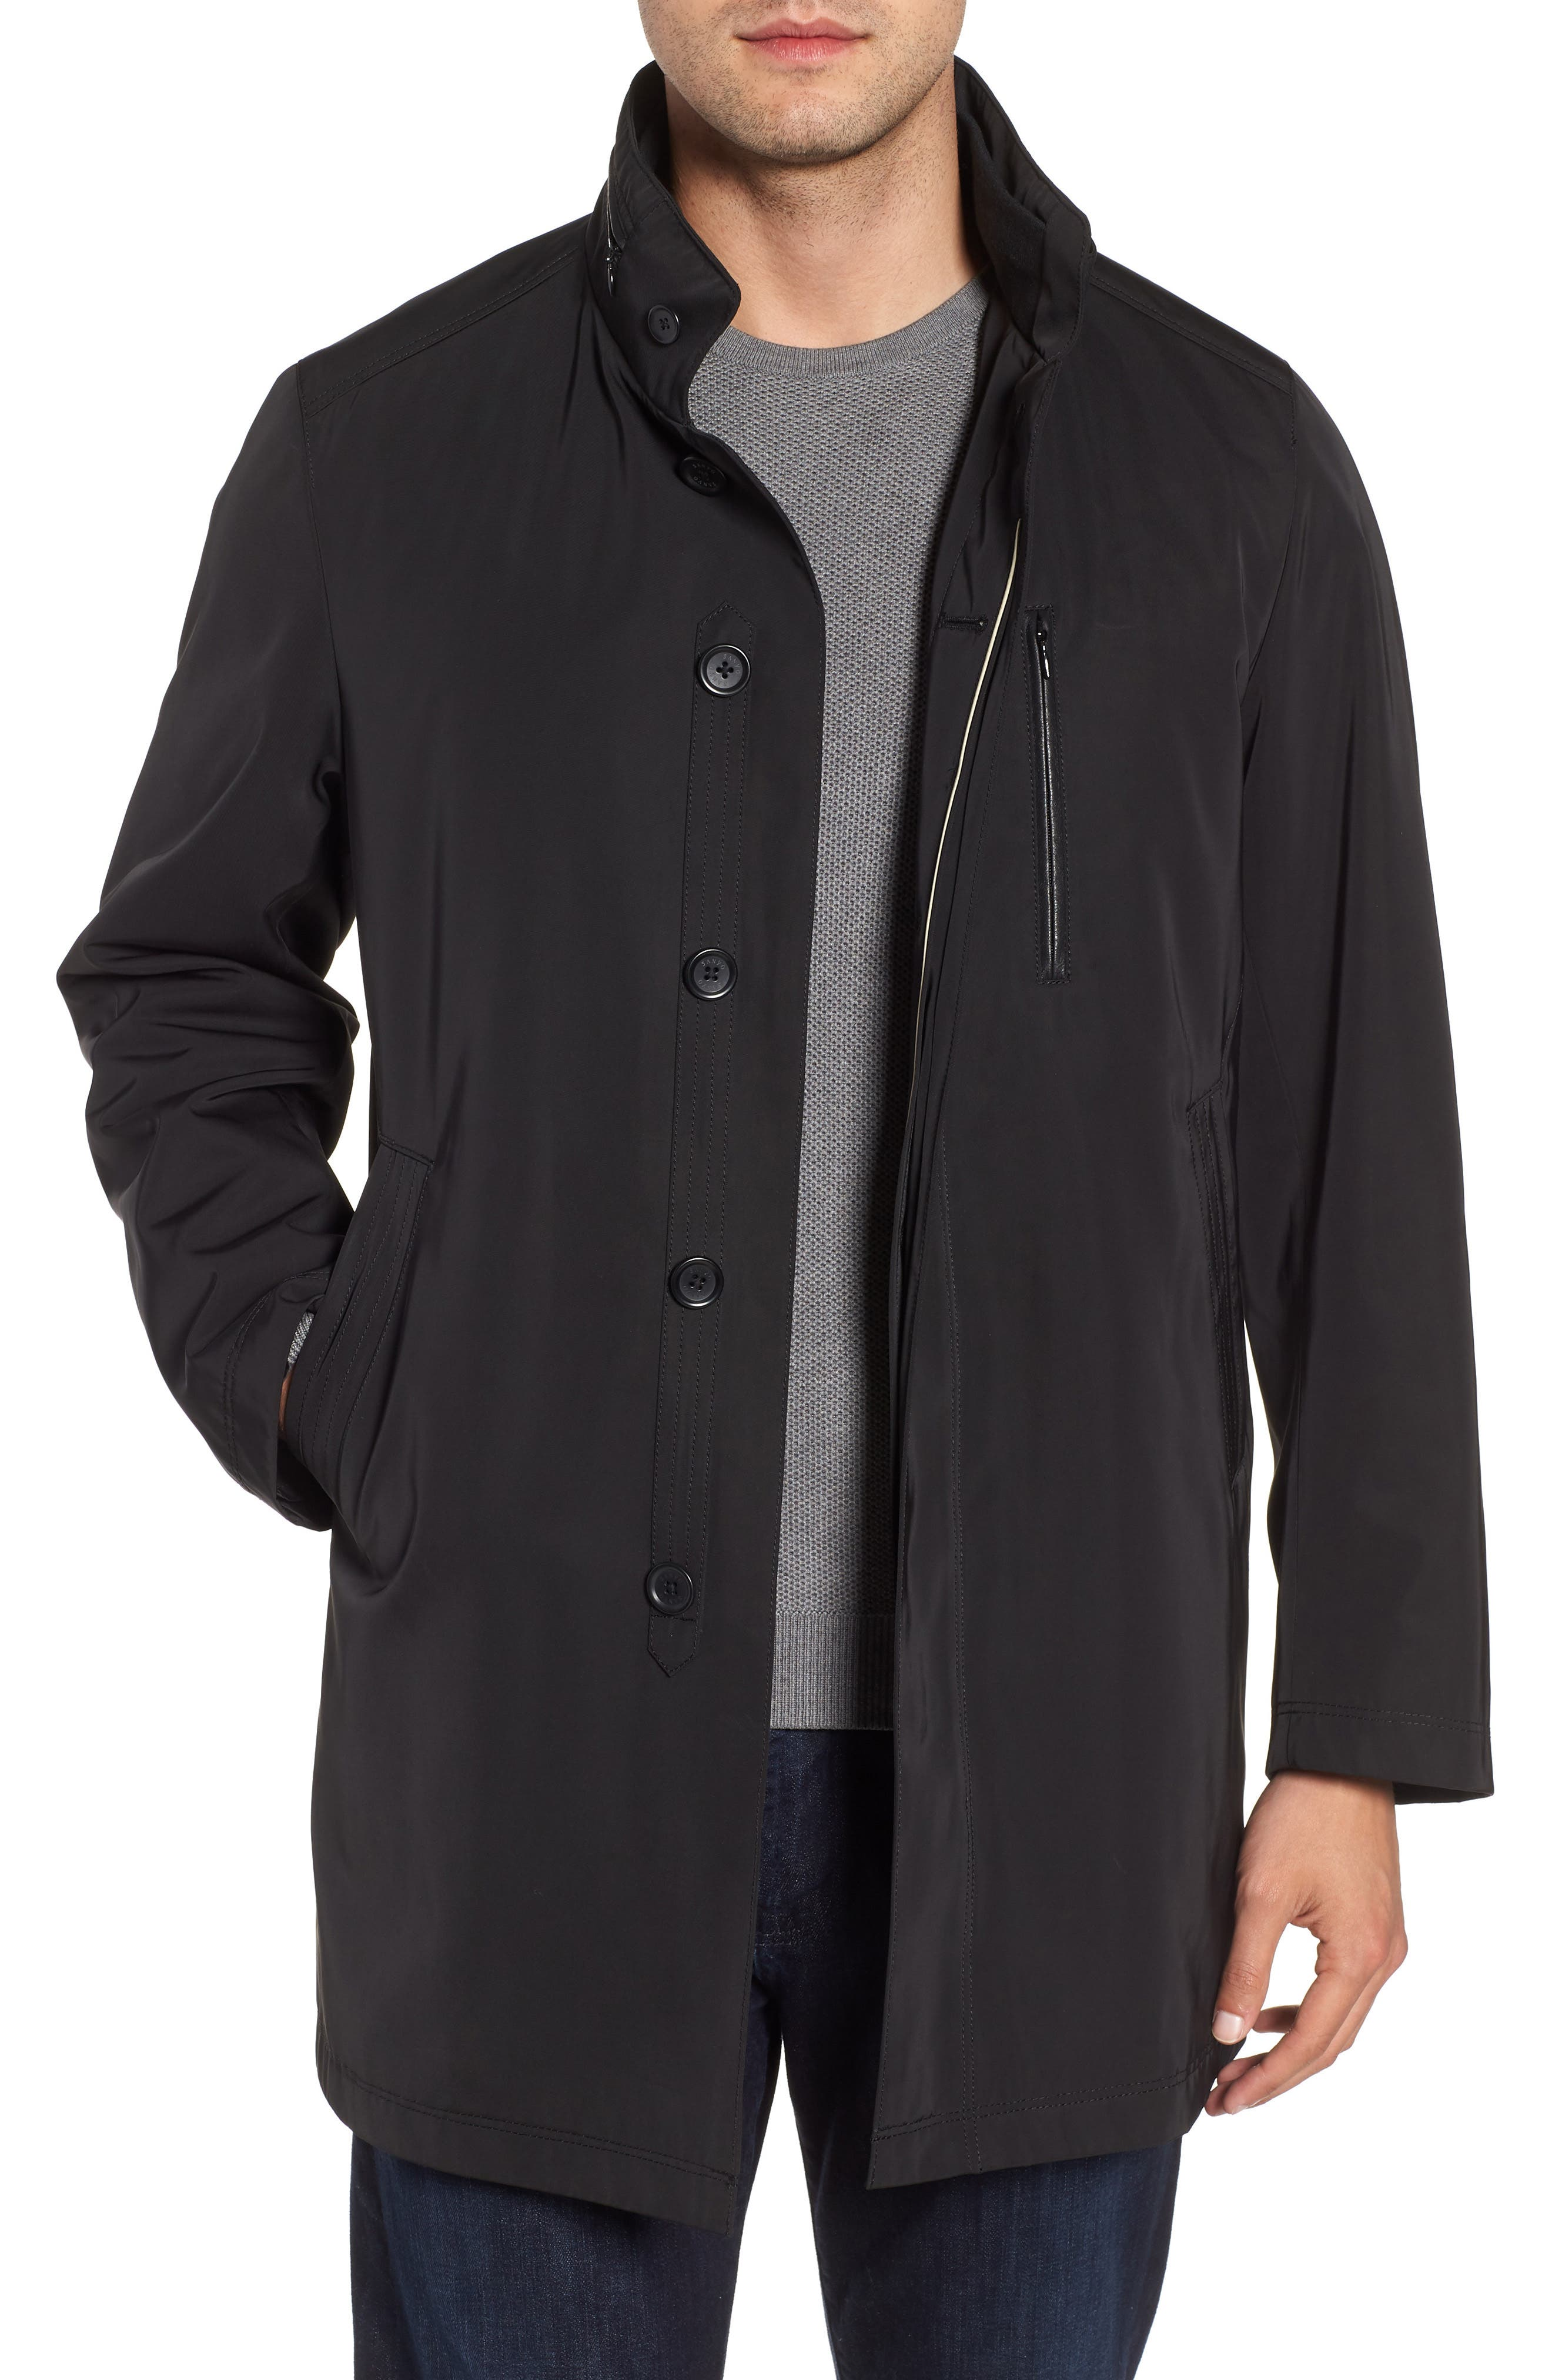 Hardy Getaway Raincoat,                             Main thumbnail 1, color,                             BLACK